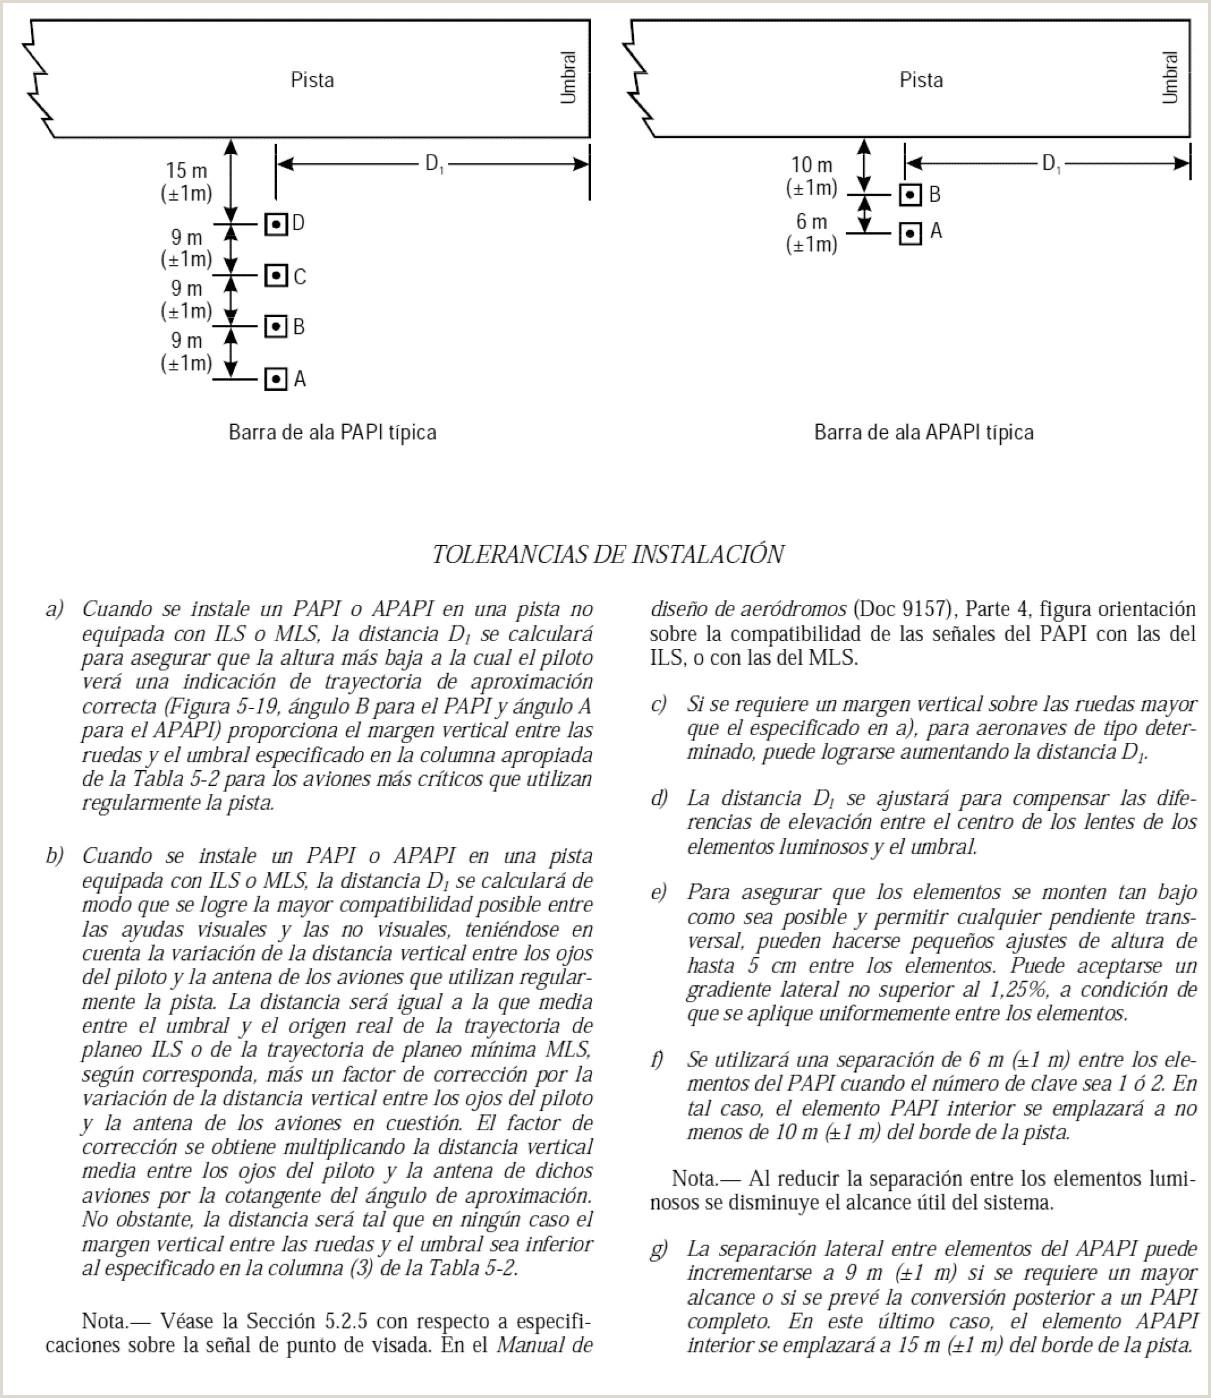 Formato Unico De Hoja De Vida Para Bomberos Boe Documento Consolidado Boe A 2009 9043